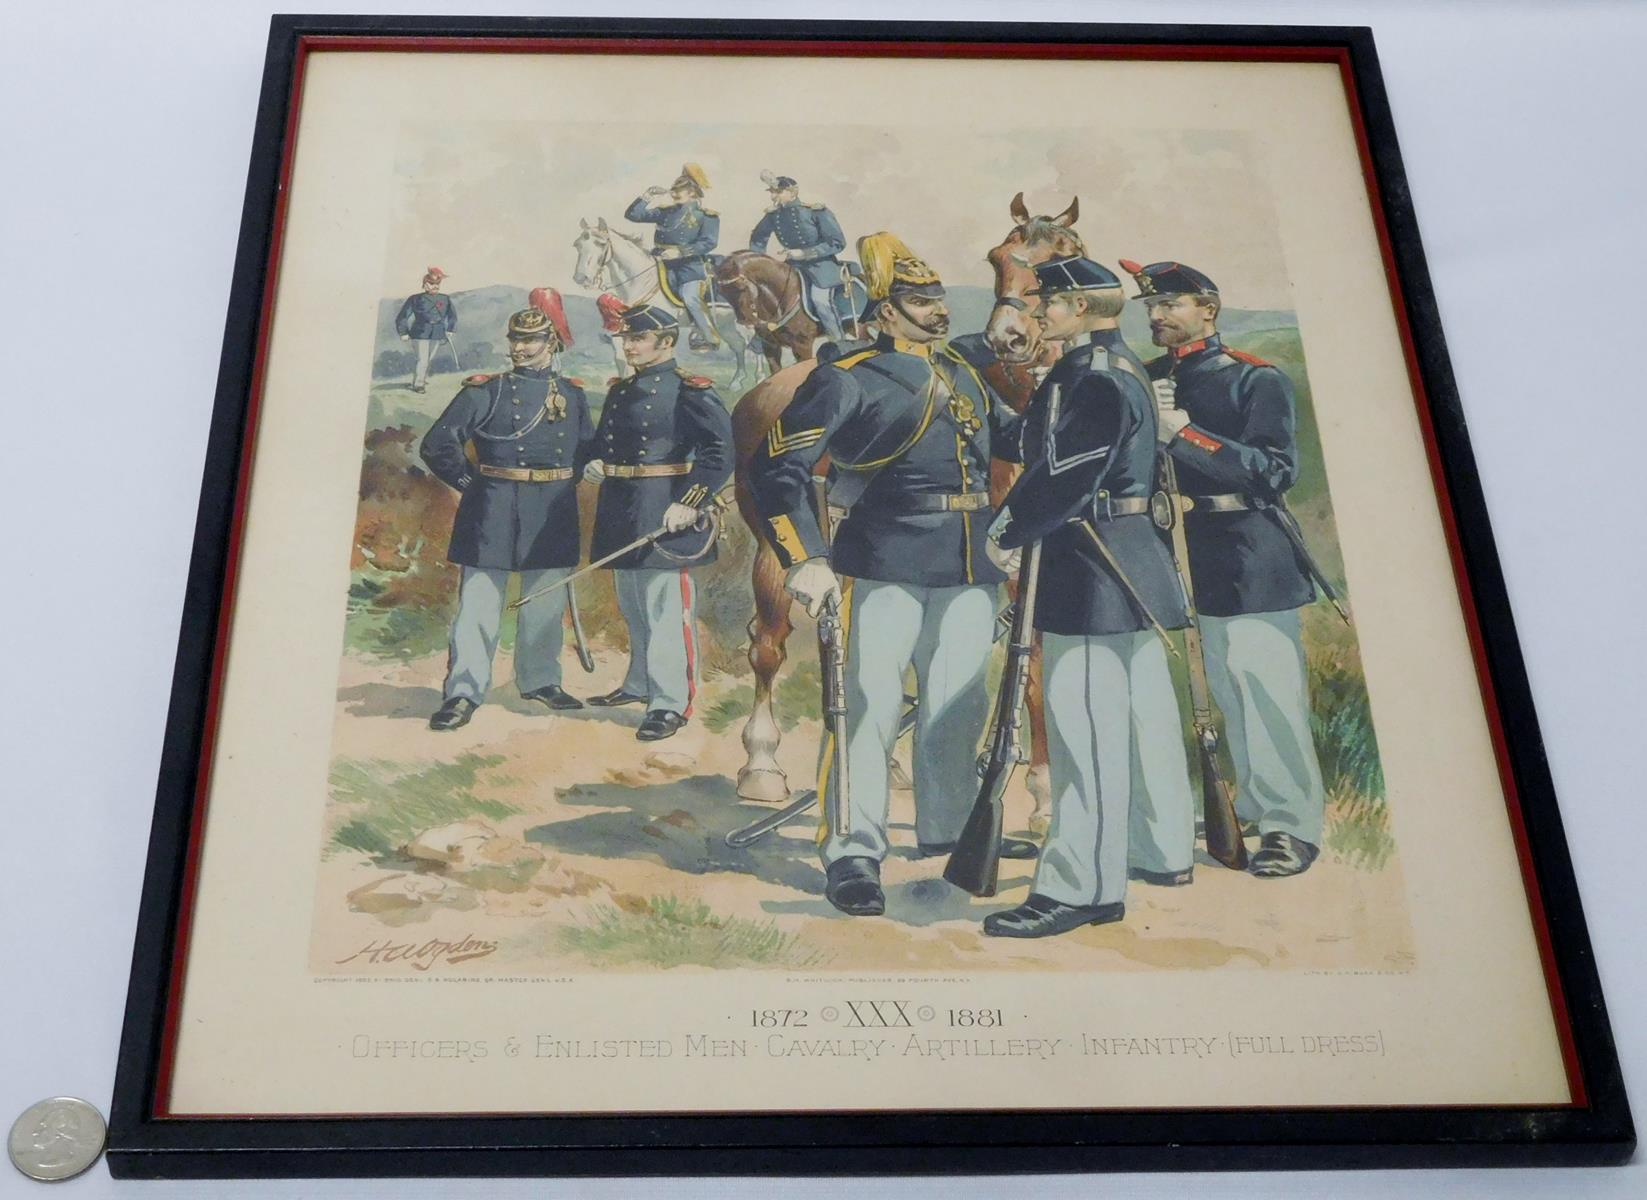 Lot Antique 1885 H A Ogden 1872 1881 Officers Enlisted Men Cavalry Artillery Infantry Chromolithograph Print Framed